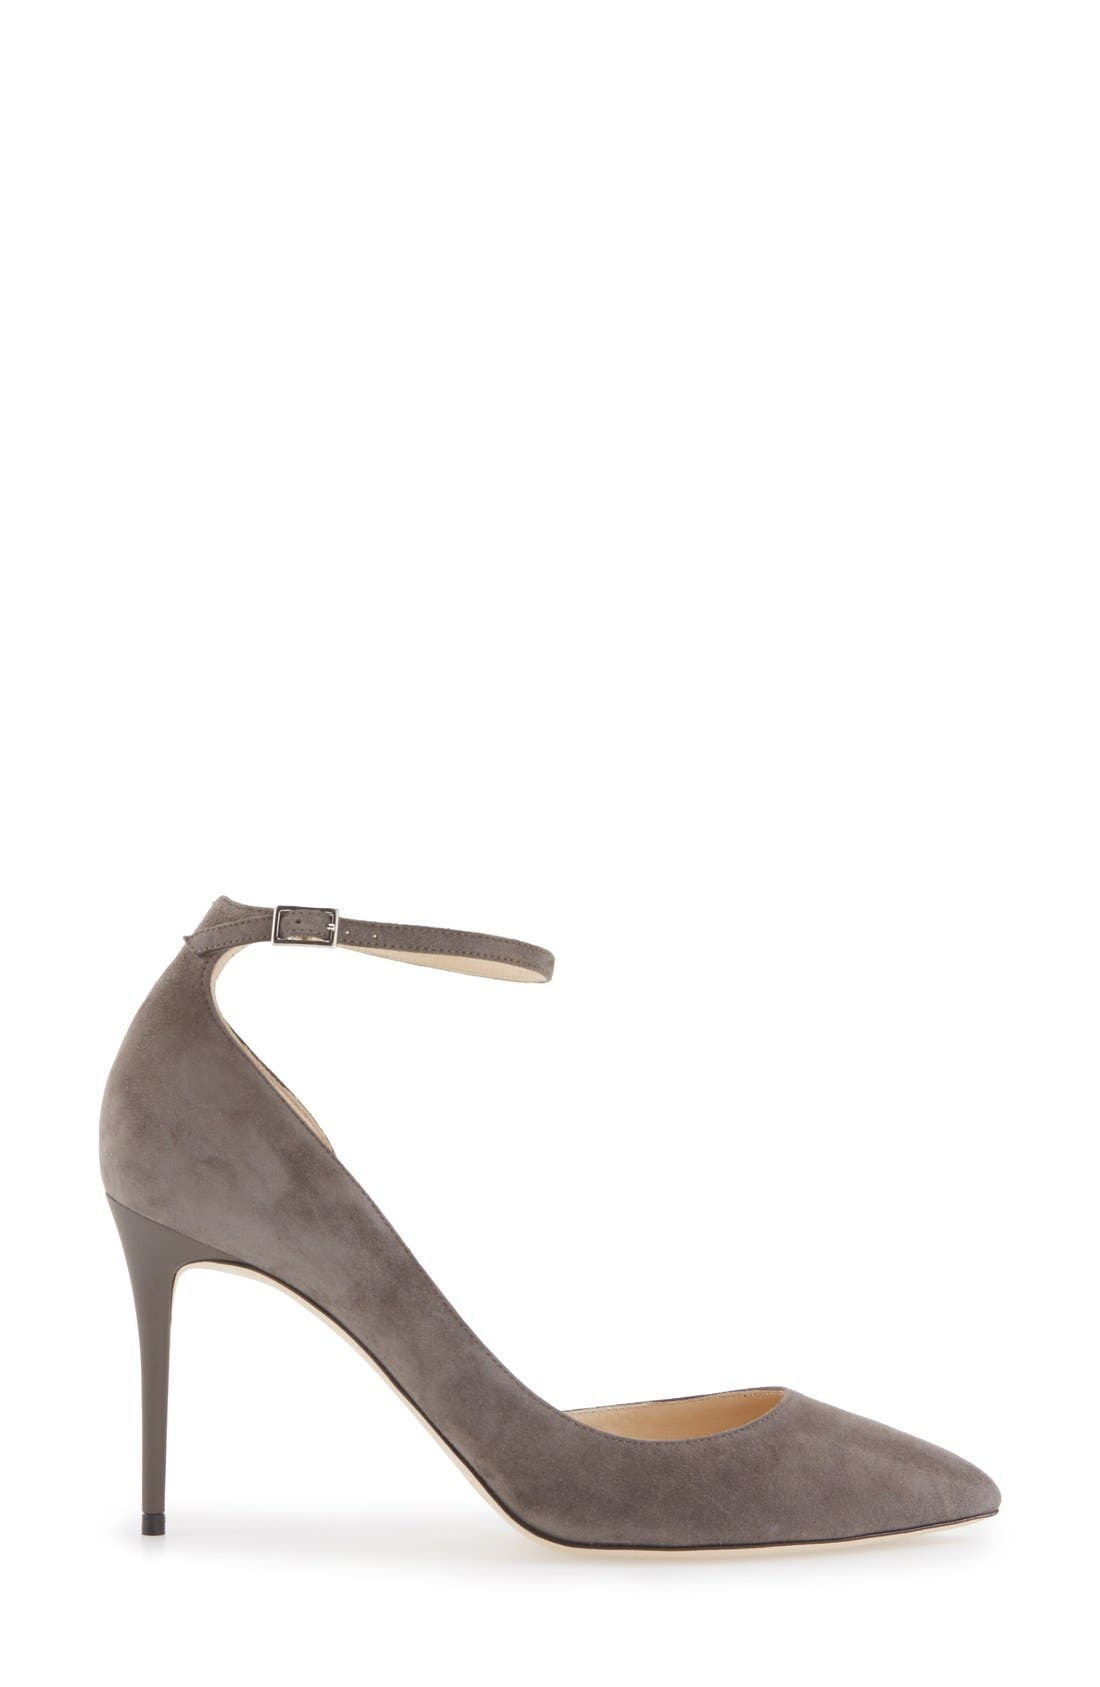 Alternate Image 4  - Jimmy Choo 'Lucy' Half d'Orsay Pointy Toe Pump (Women)